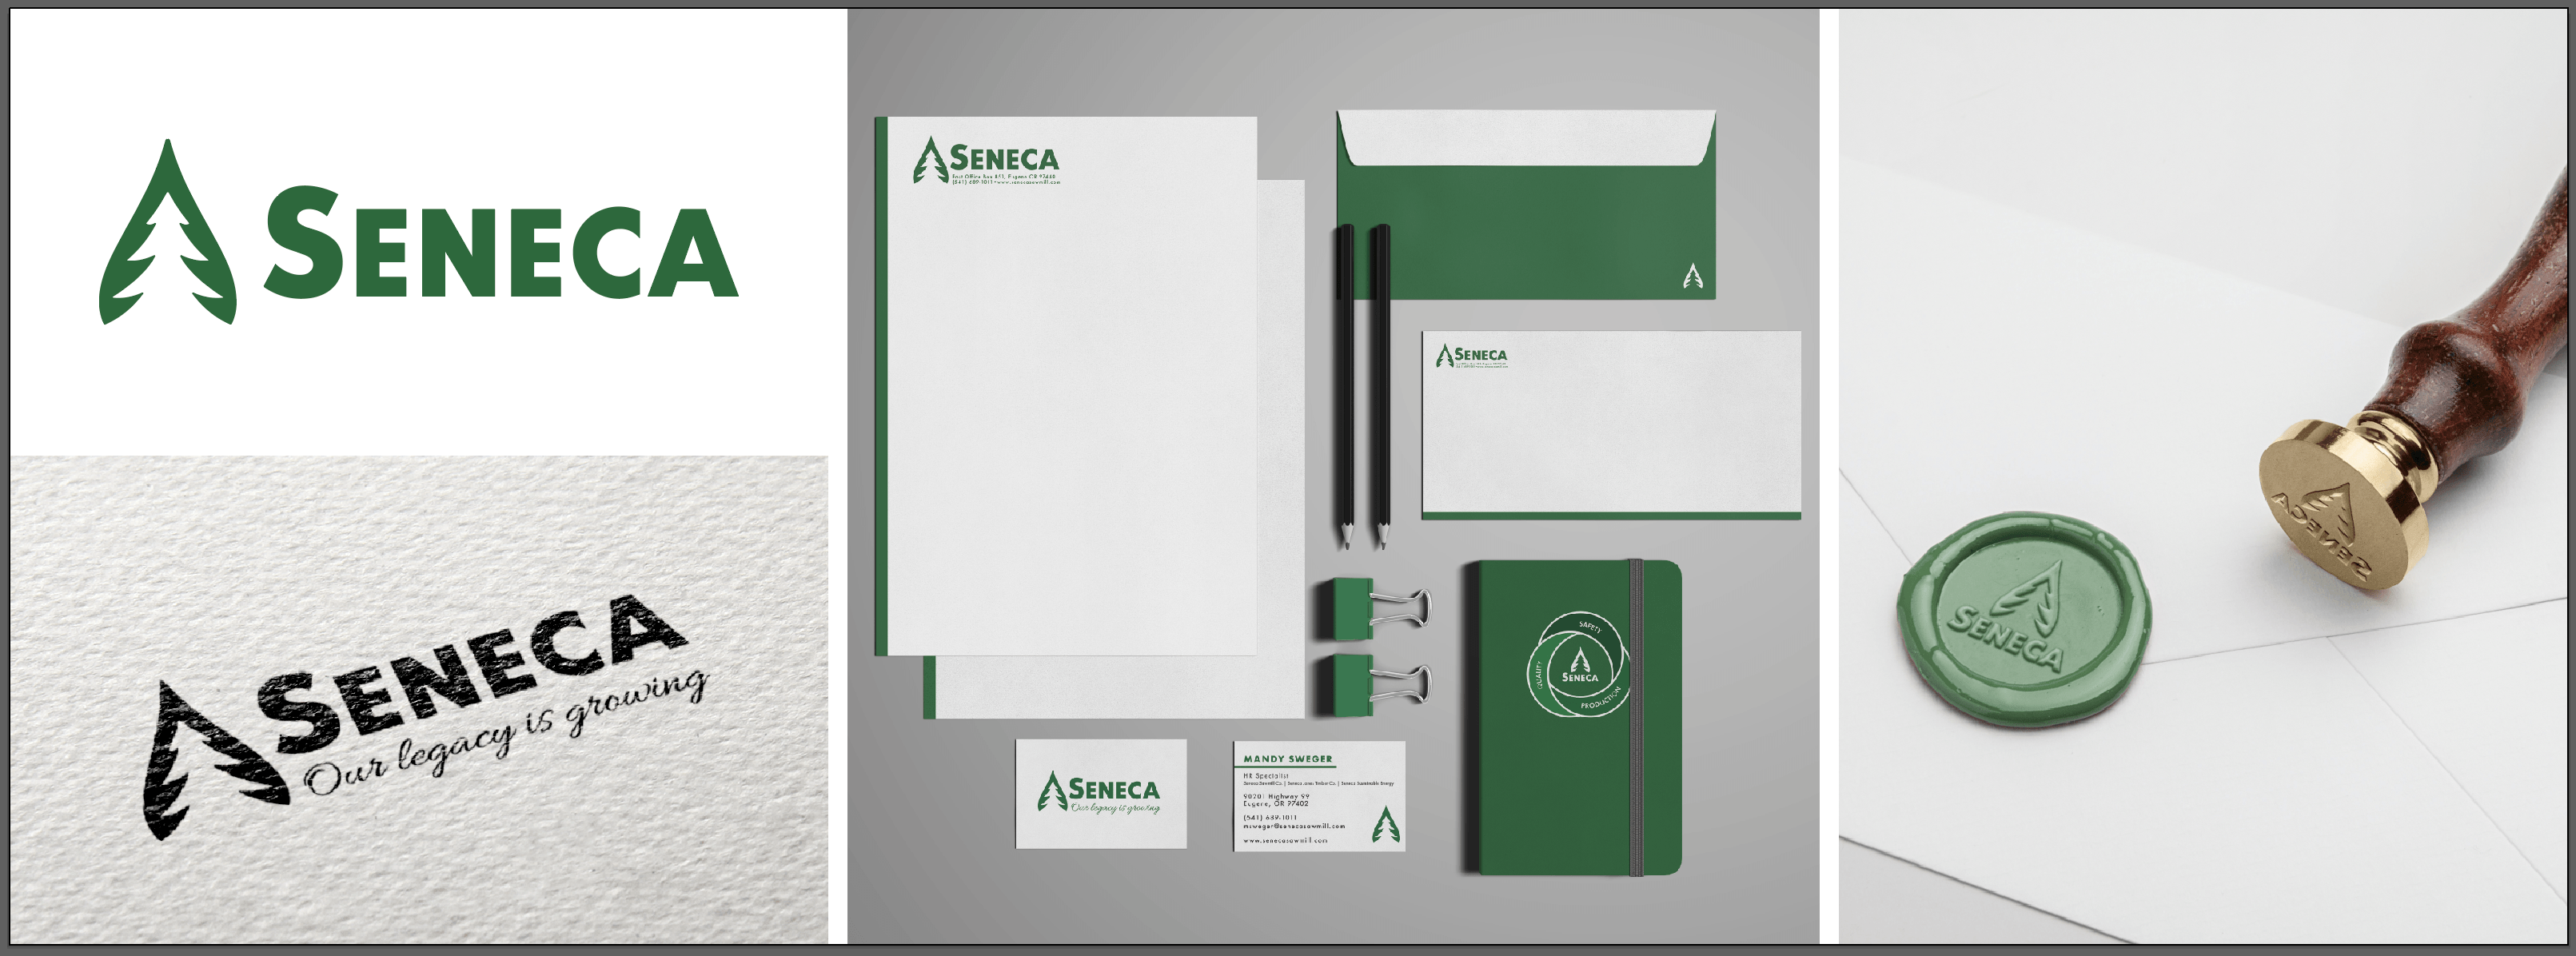 Case Study: Seneca Rebrand